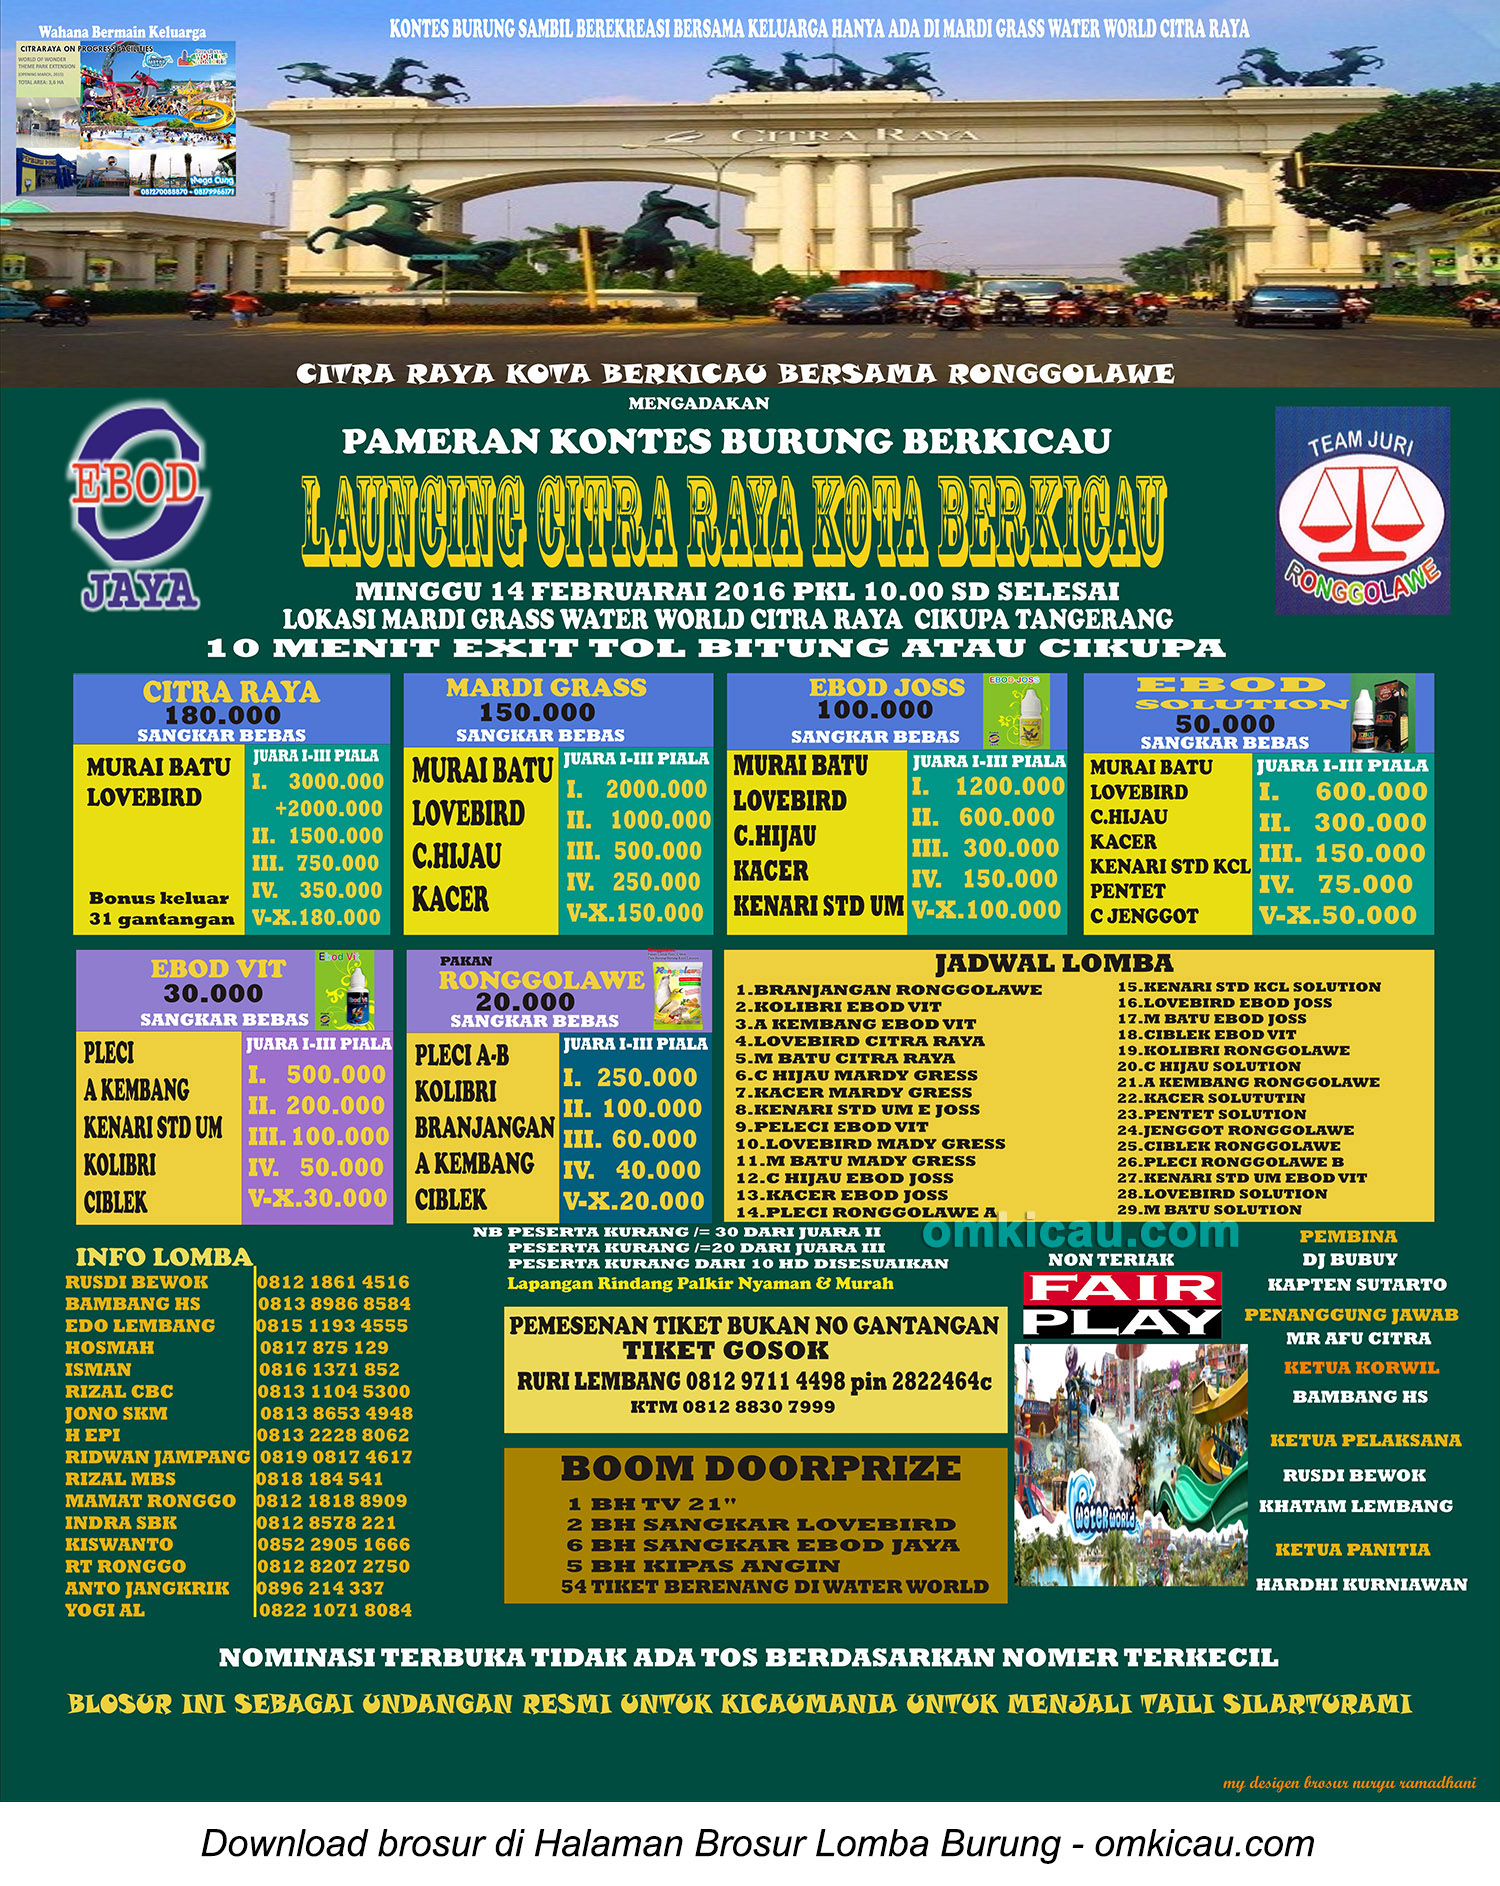 Brosur Lomba Burung Launching Citra Raya Kota Berkicau, Tangerang, 14 Februari 2016